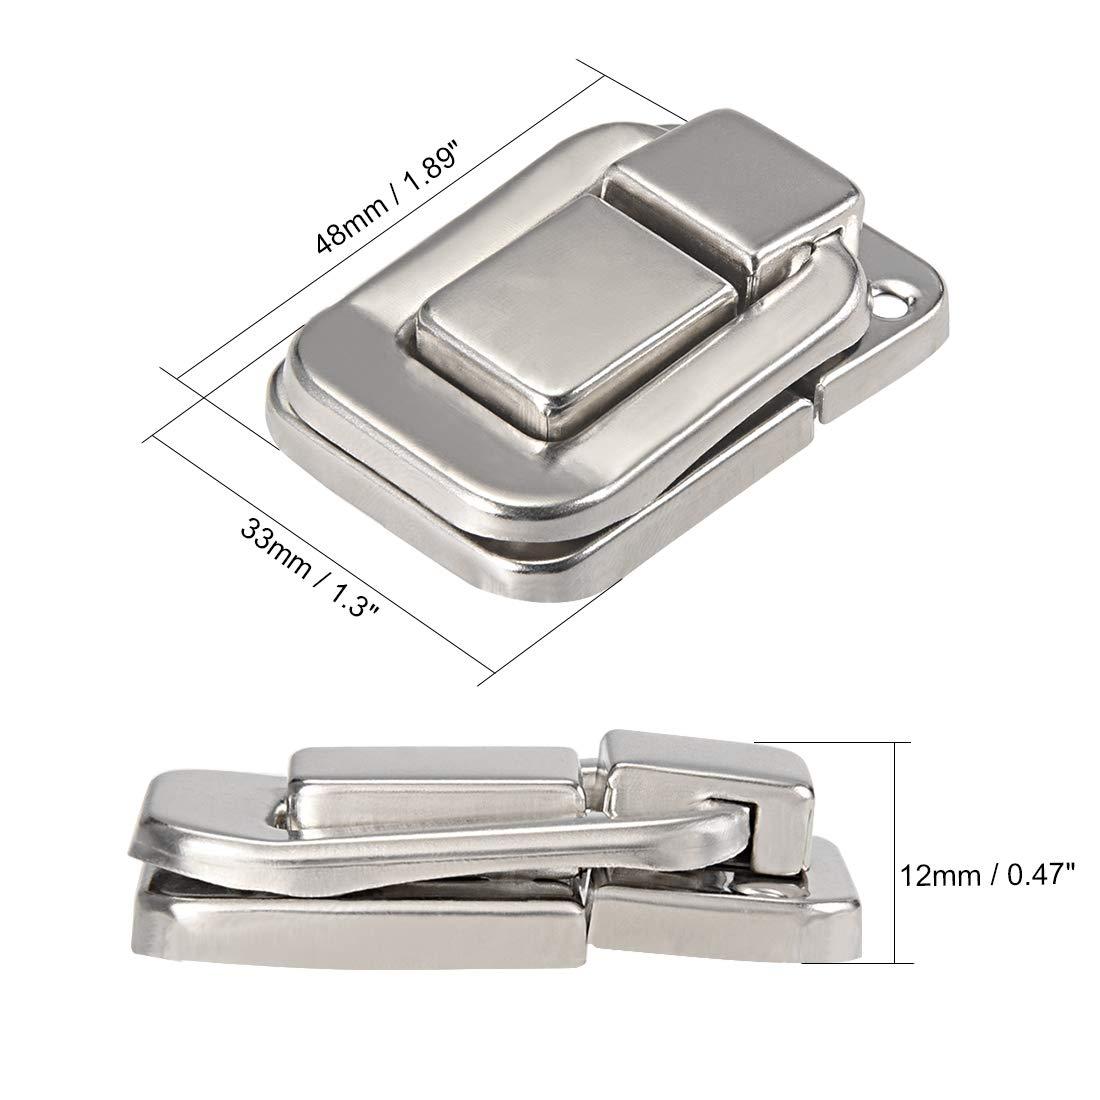 48mm dekorative Haspe Schmuckschatulle mit Schrauben DE sourcing map 5 StkToggle Verriegeln